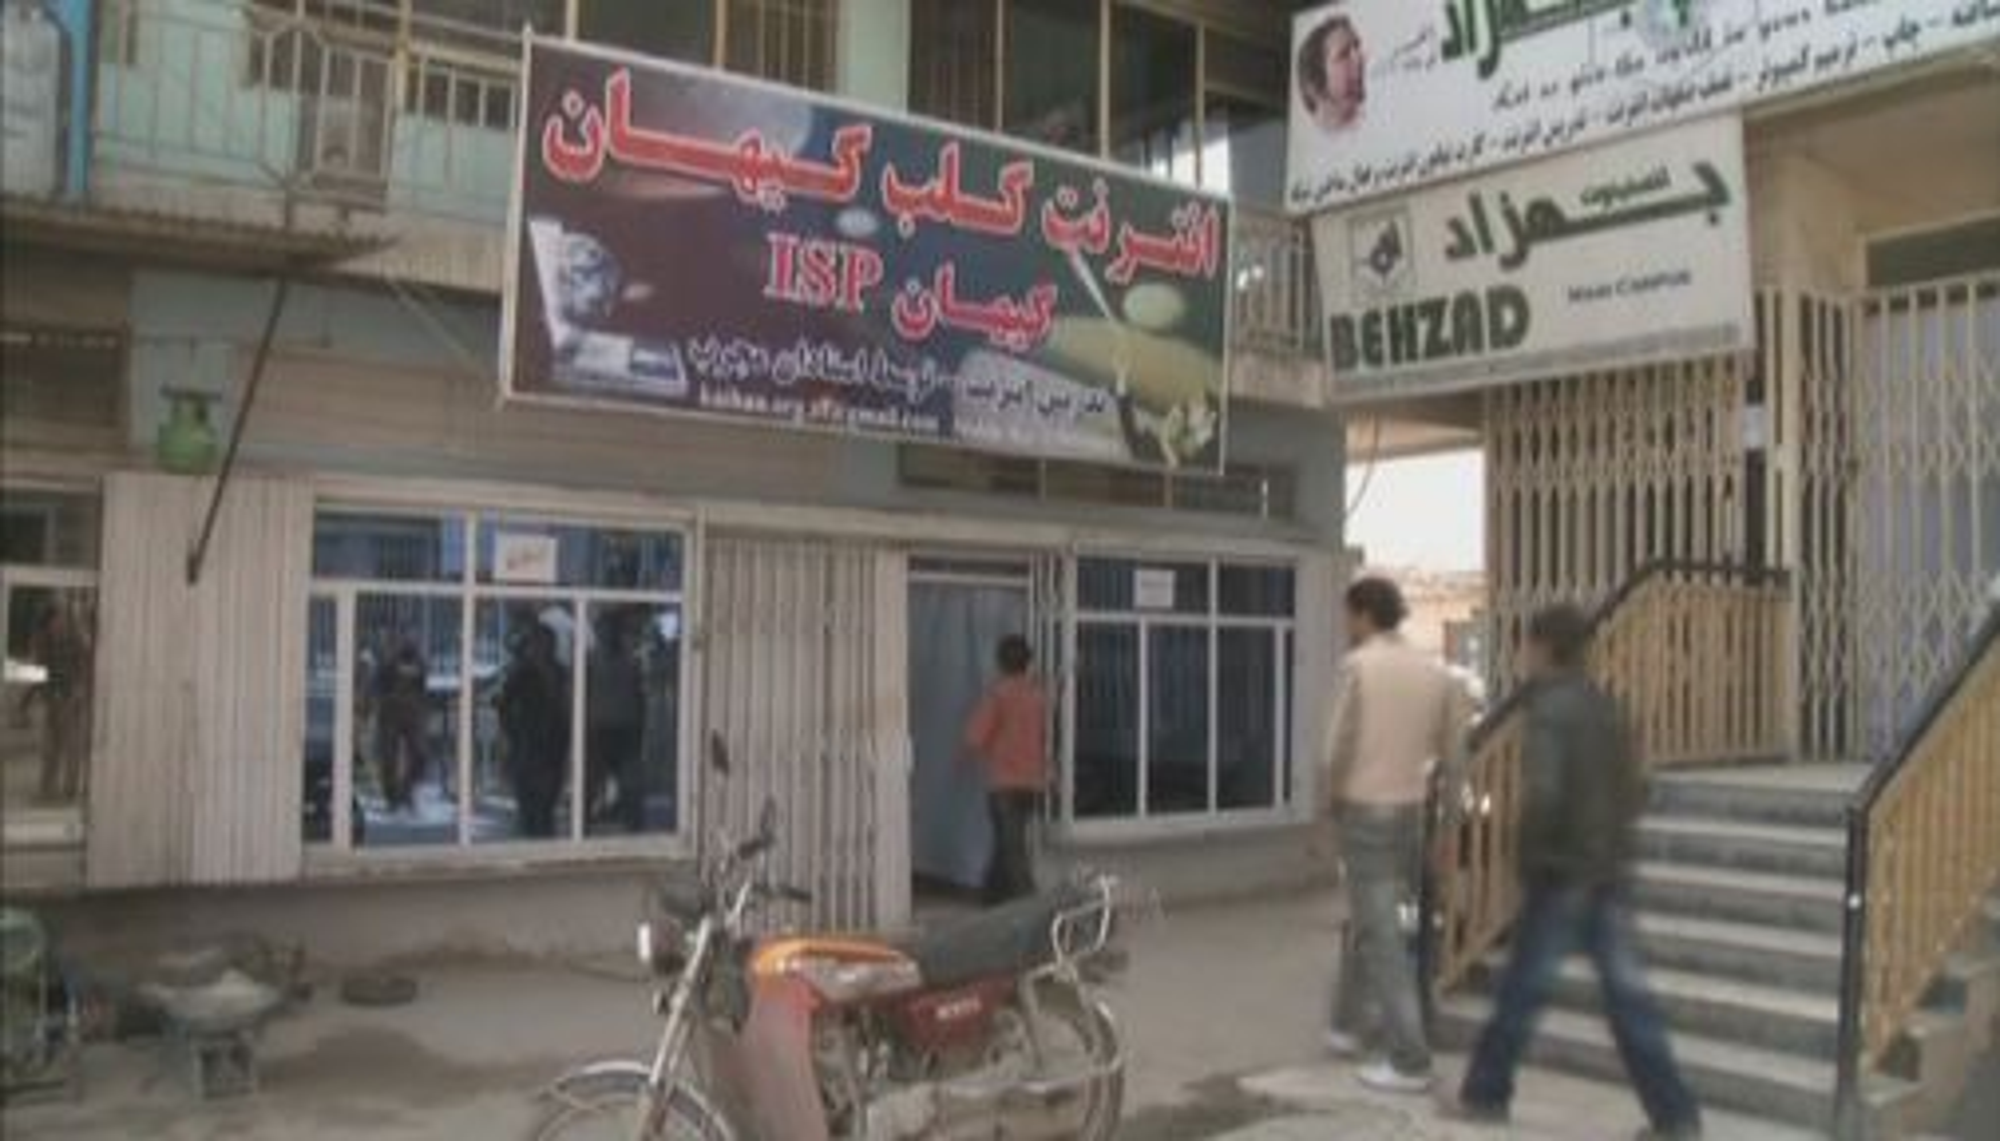 Internett-kafeer er svært popuplære i Afghanistans hovedstad Kabul (foto: Nato Channel).